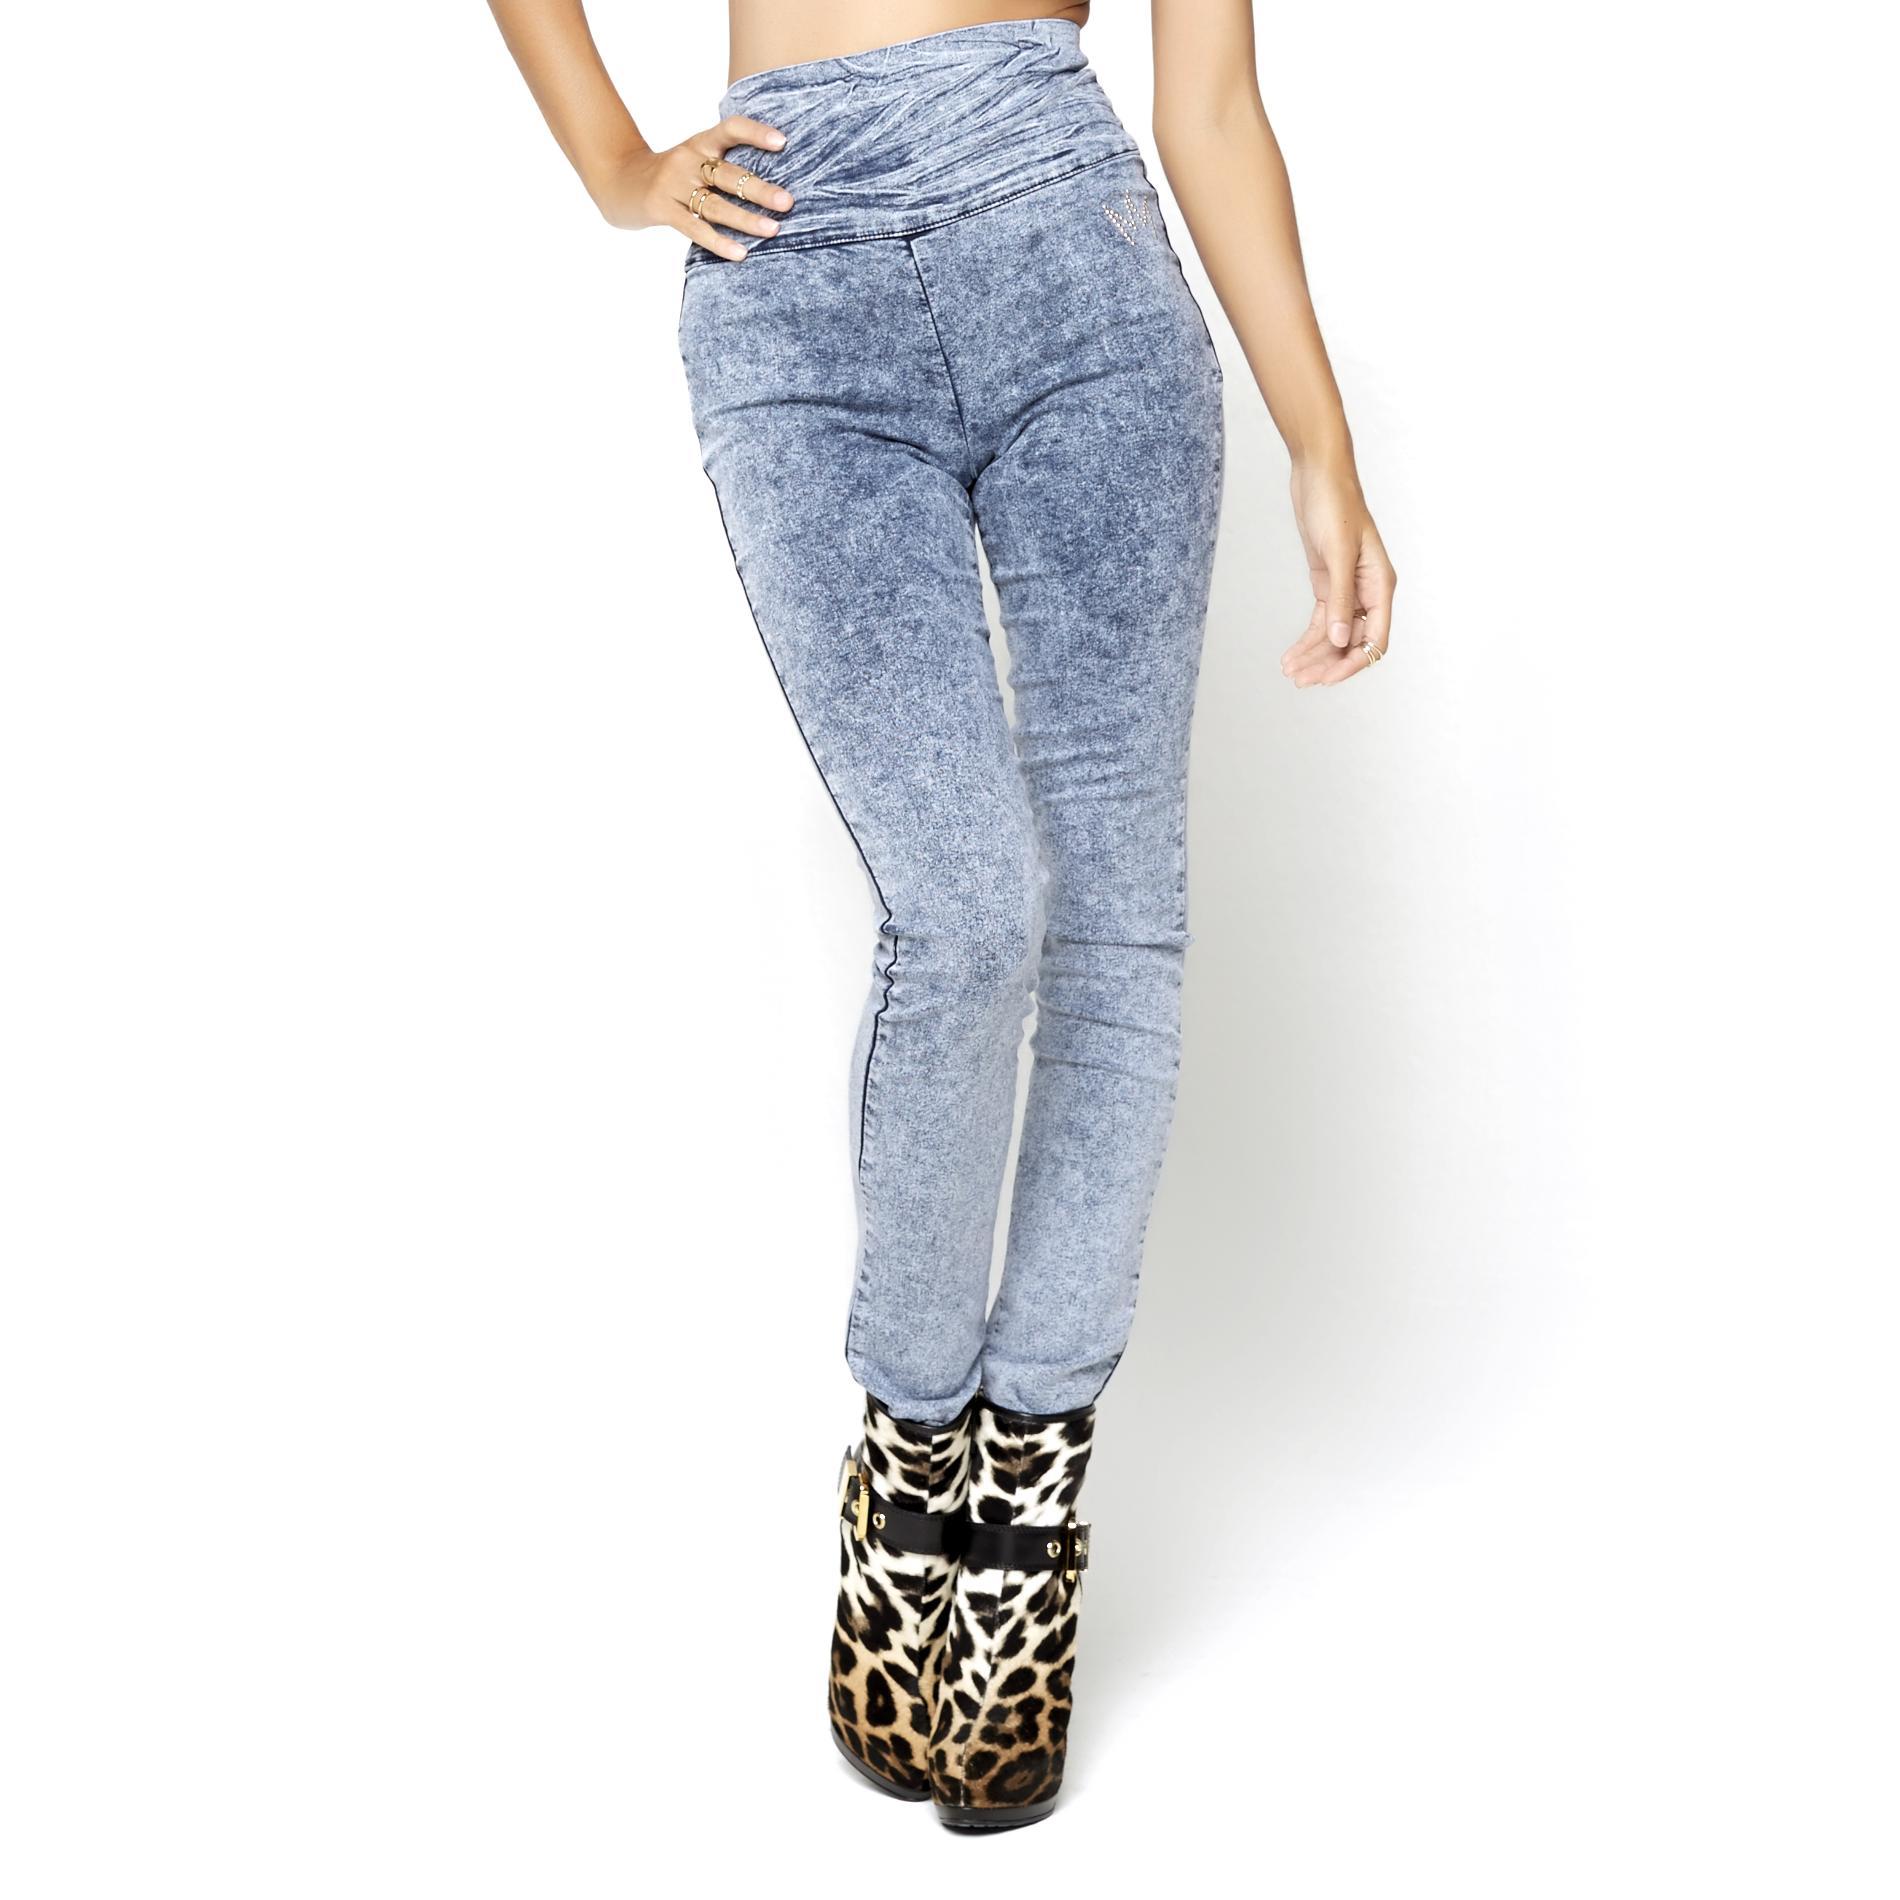 Nicki Minaj Women's High Rise Denim Leggings at Kmart.com